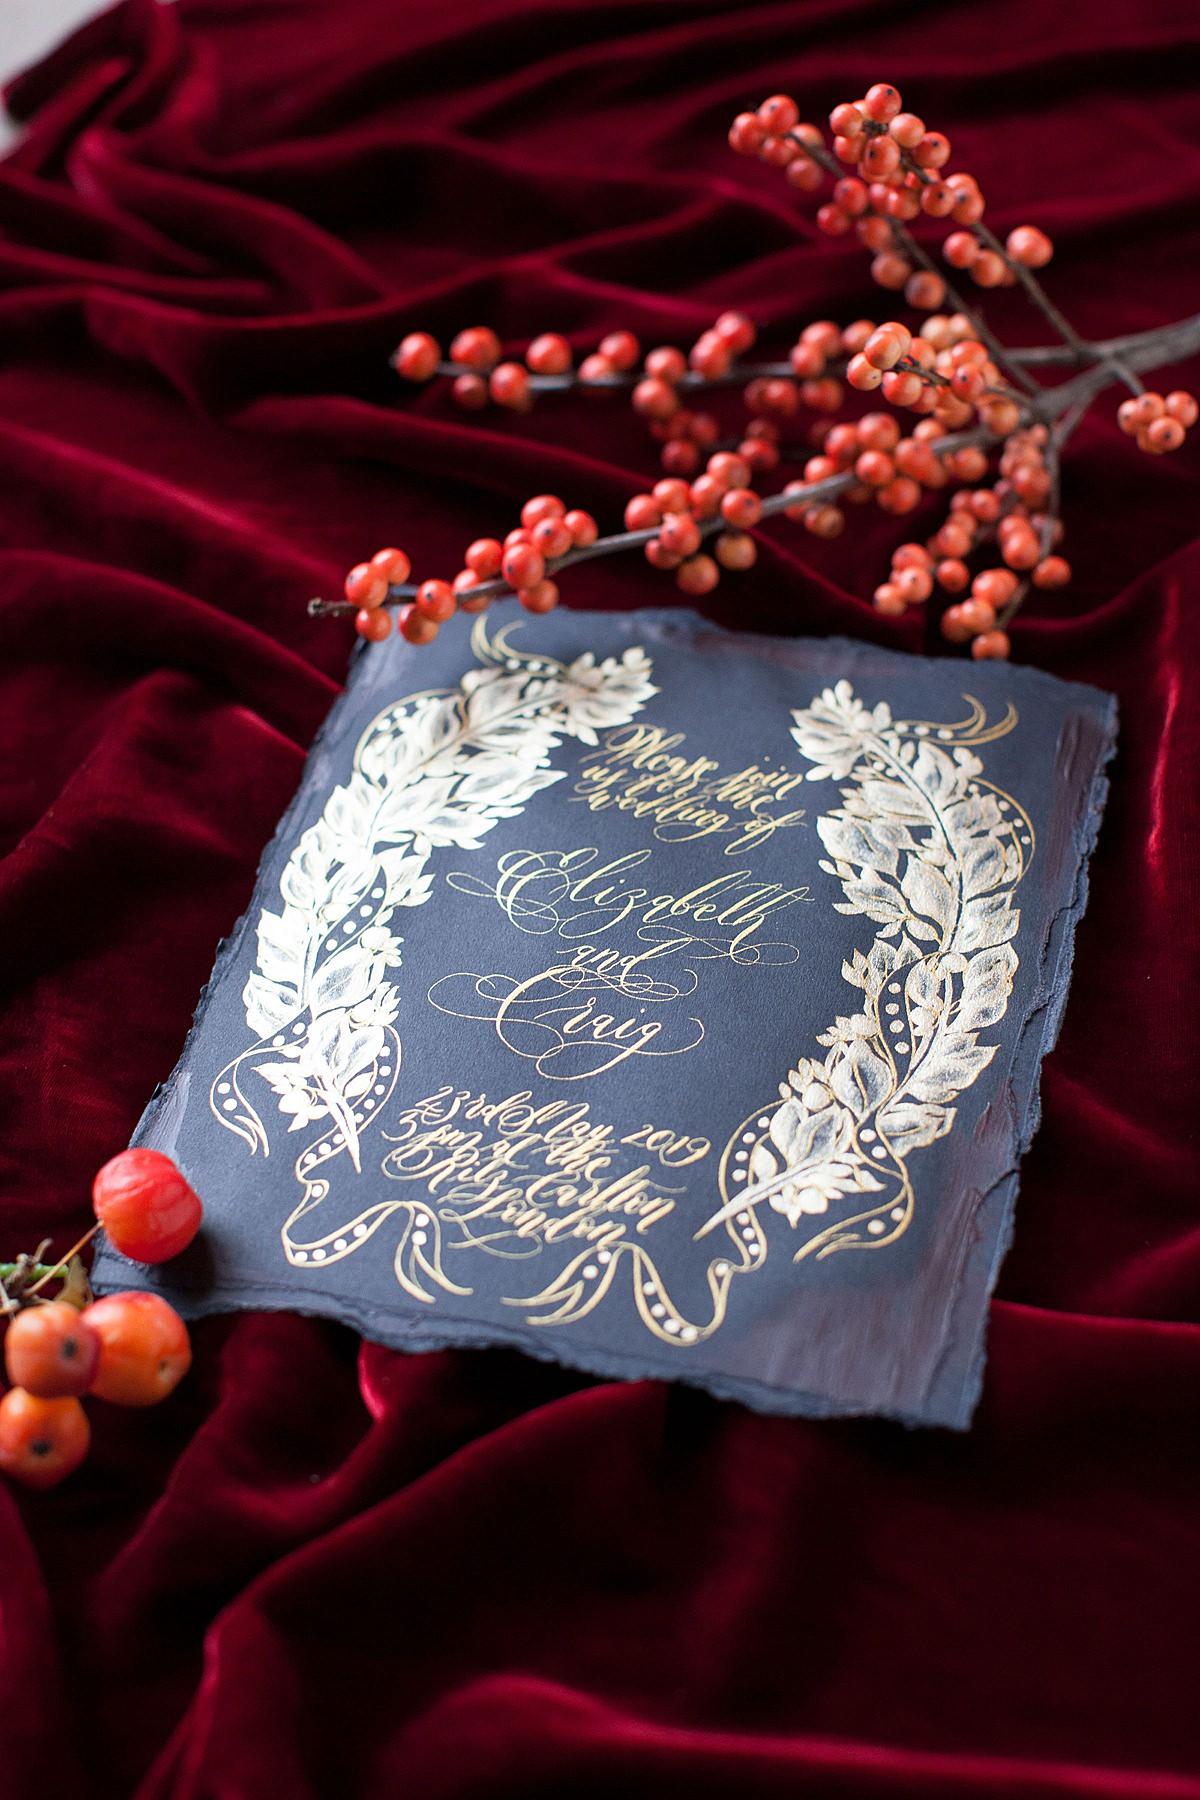 Briar-Rose-Stationery-Crimson-Letters-JoBradbury (3).jpg